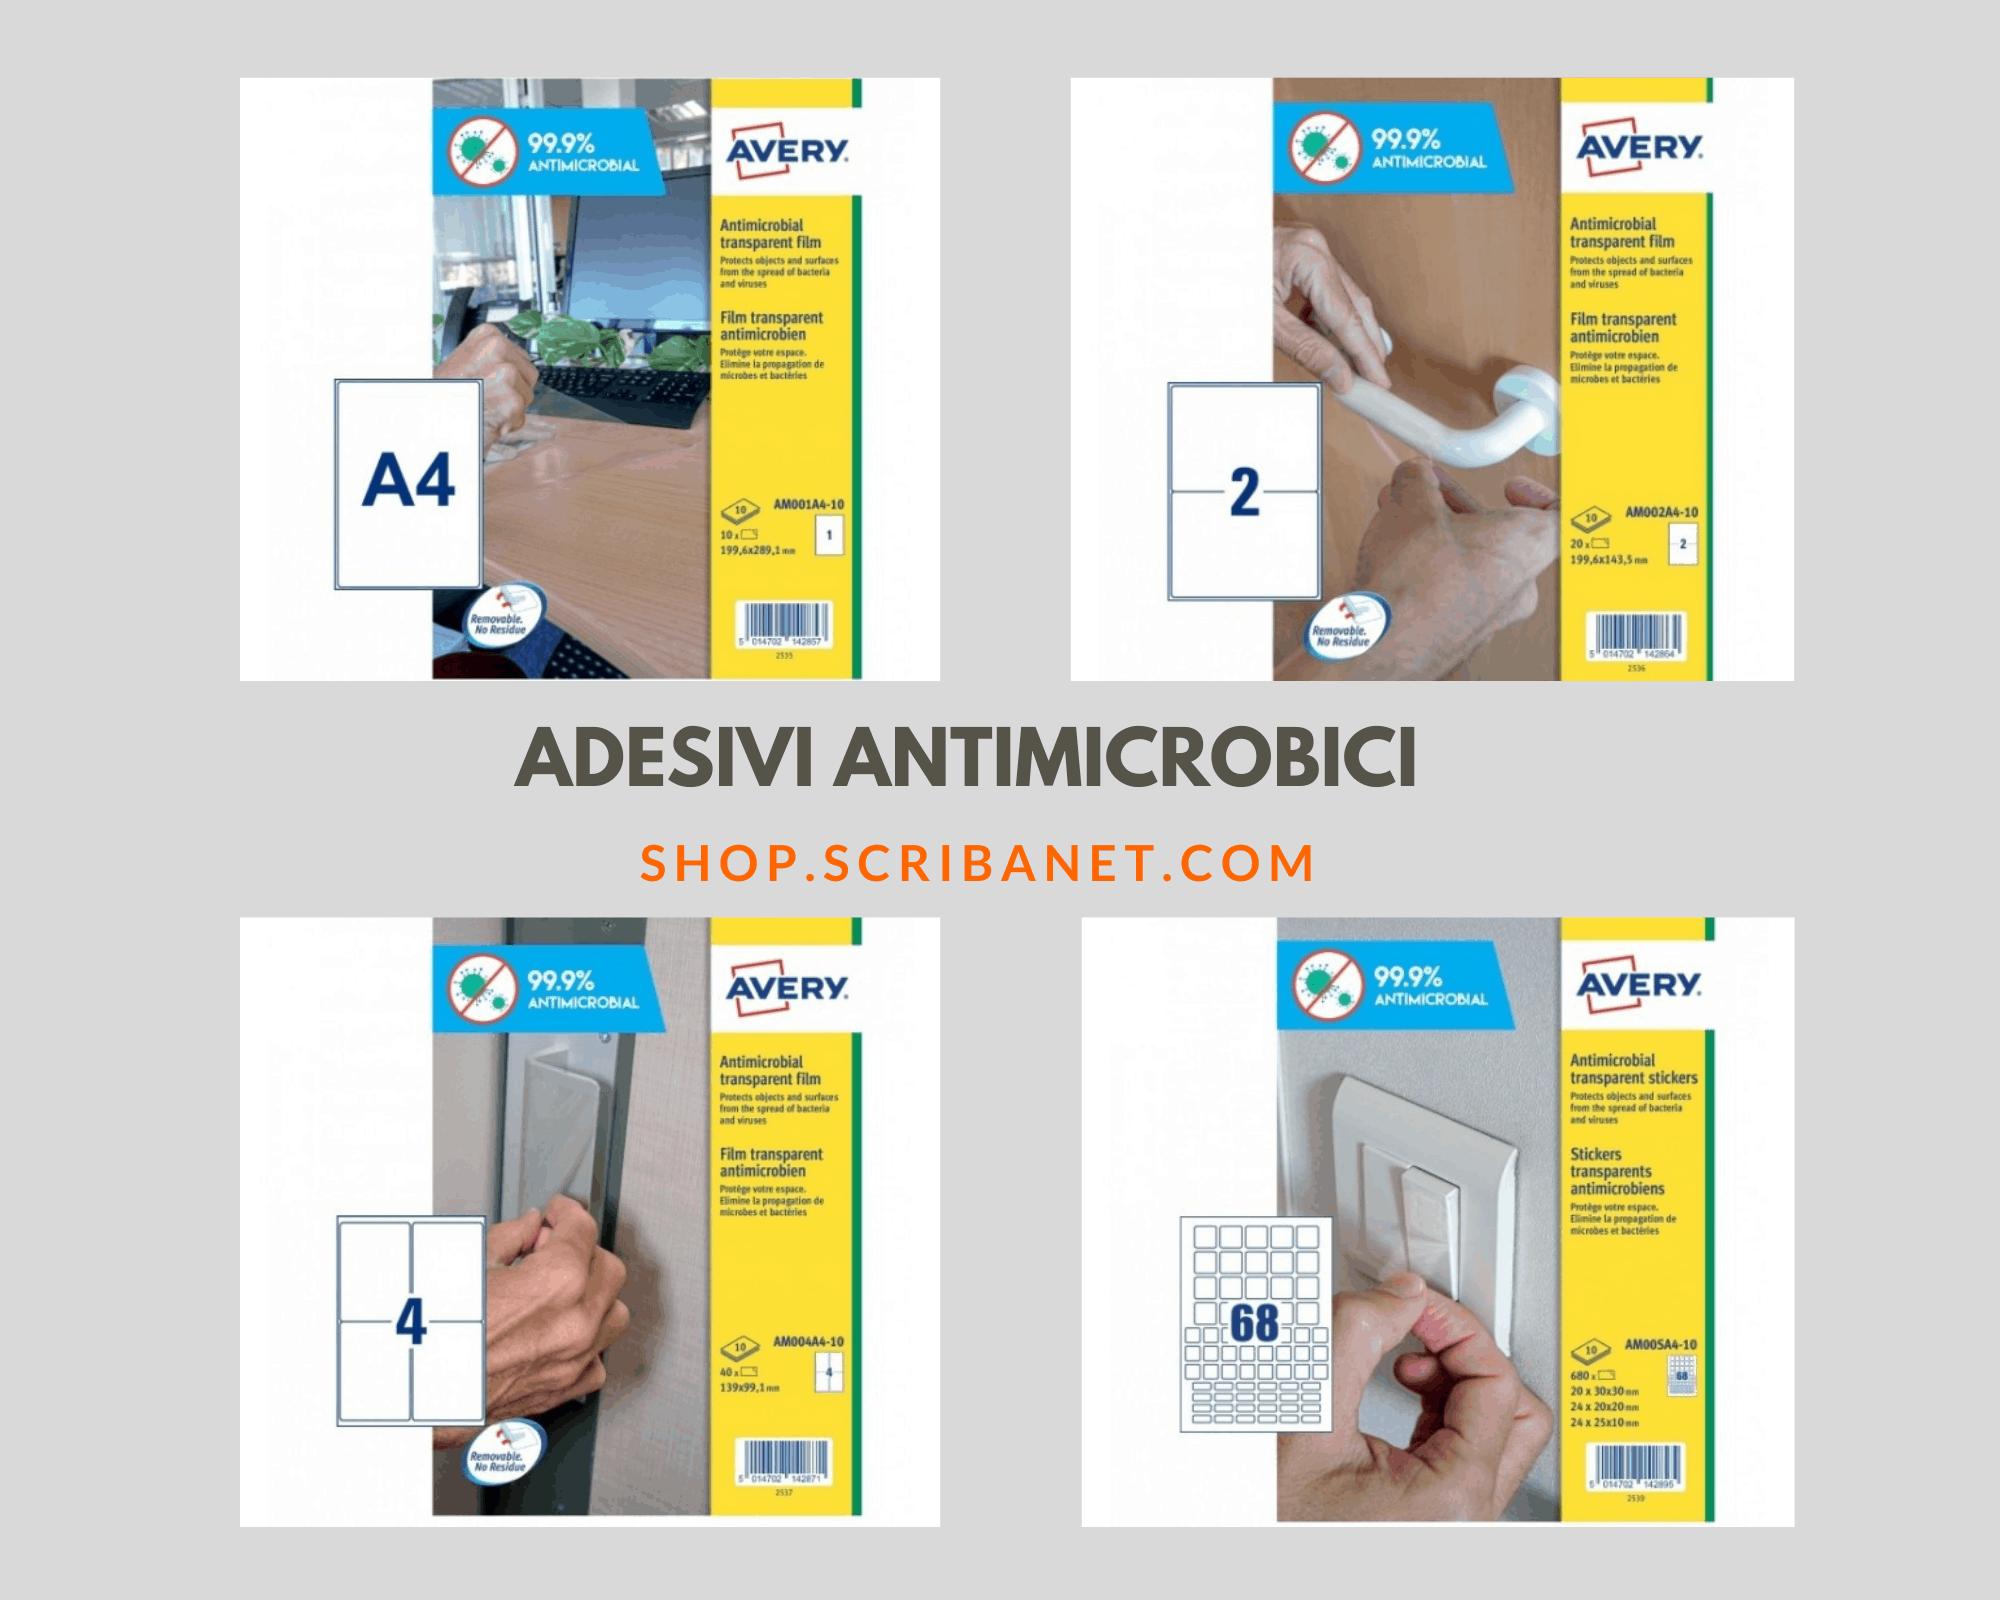 Adesivi Avery Antimicrobici